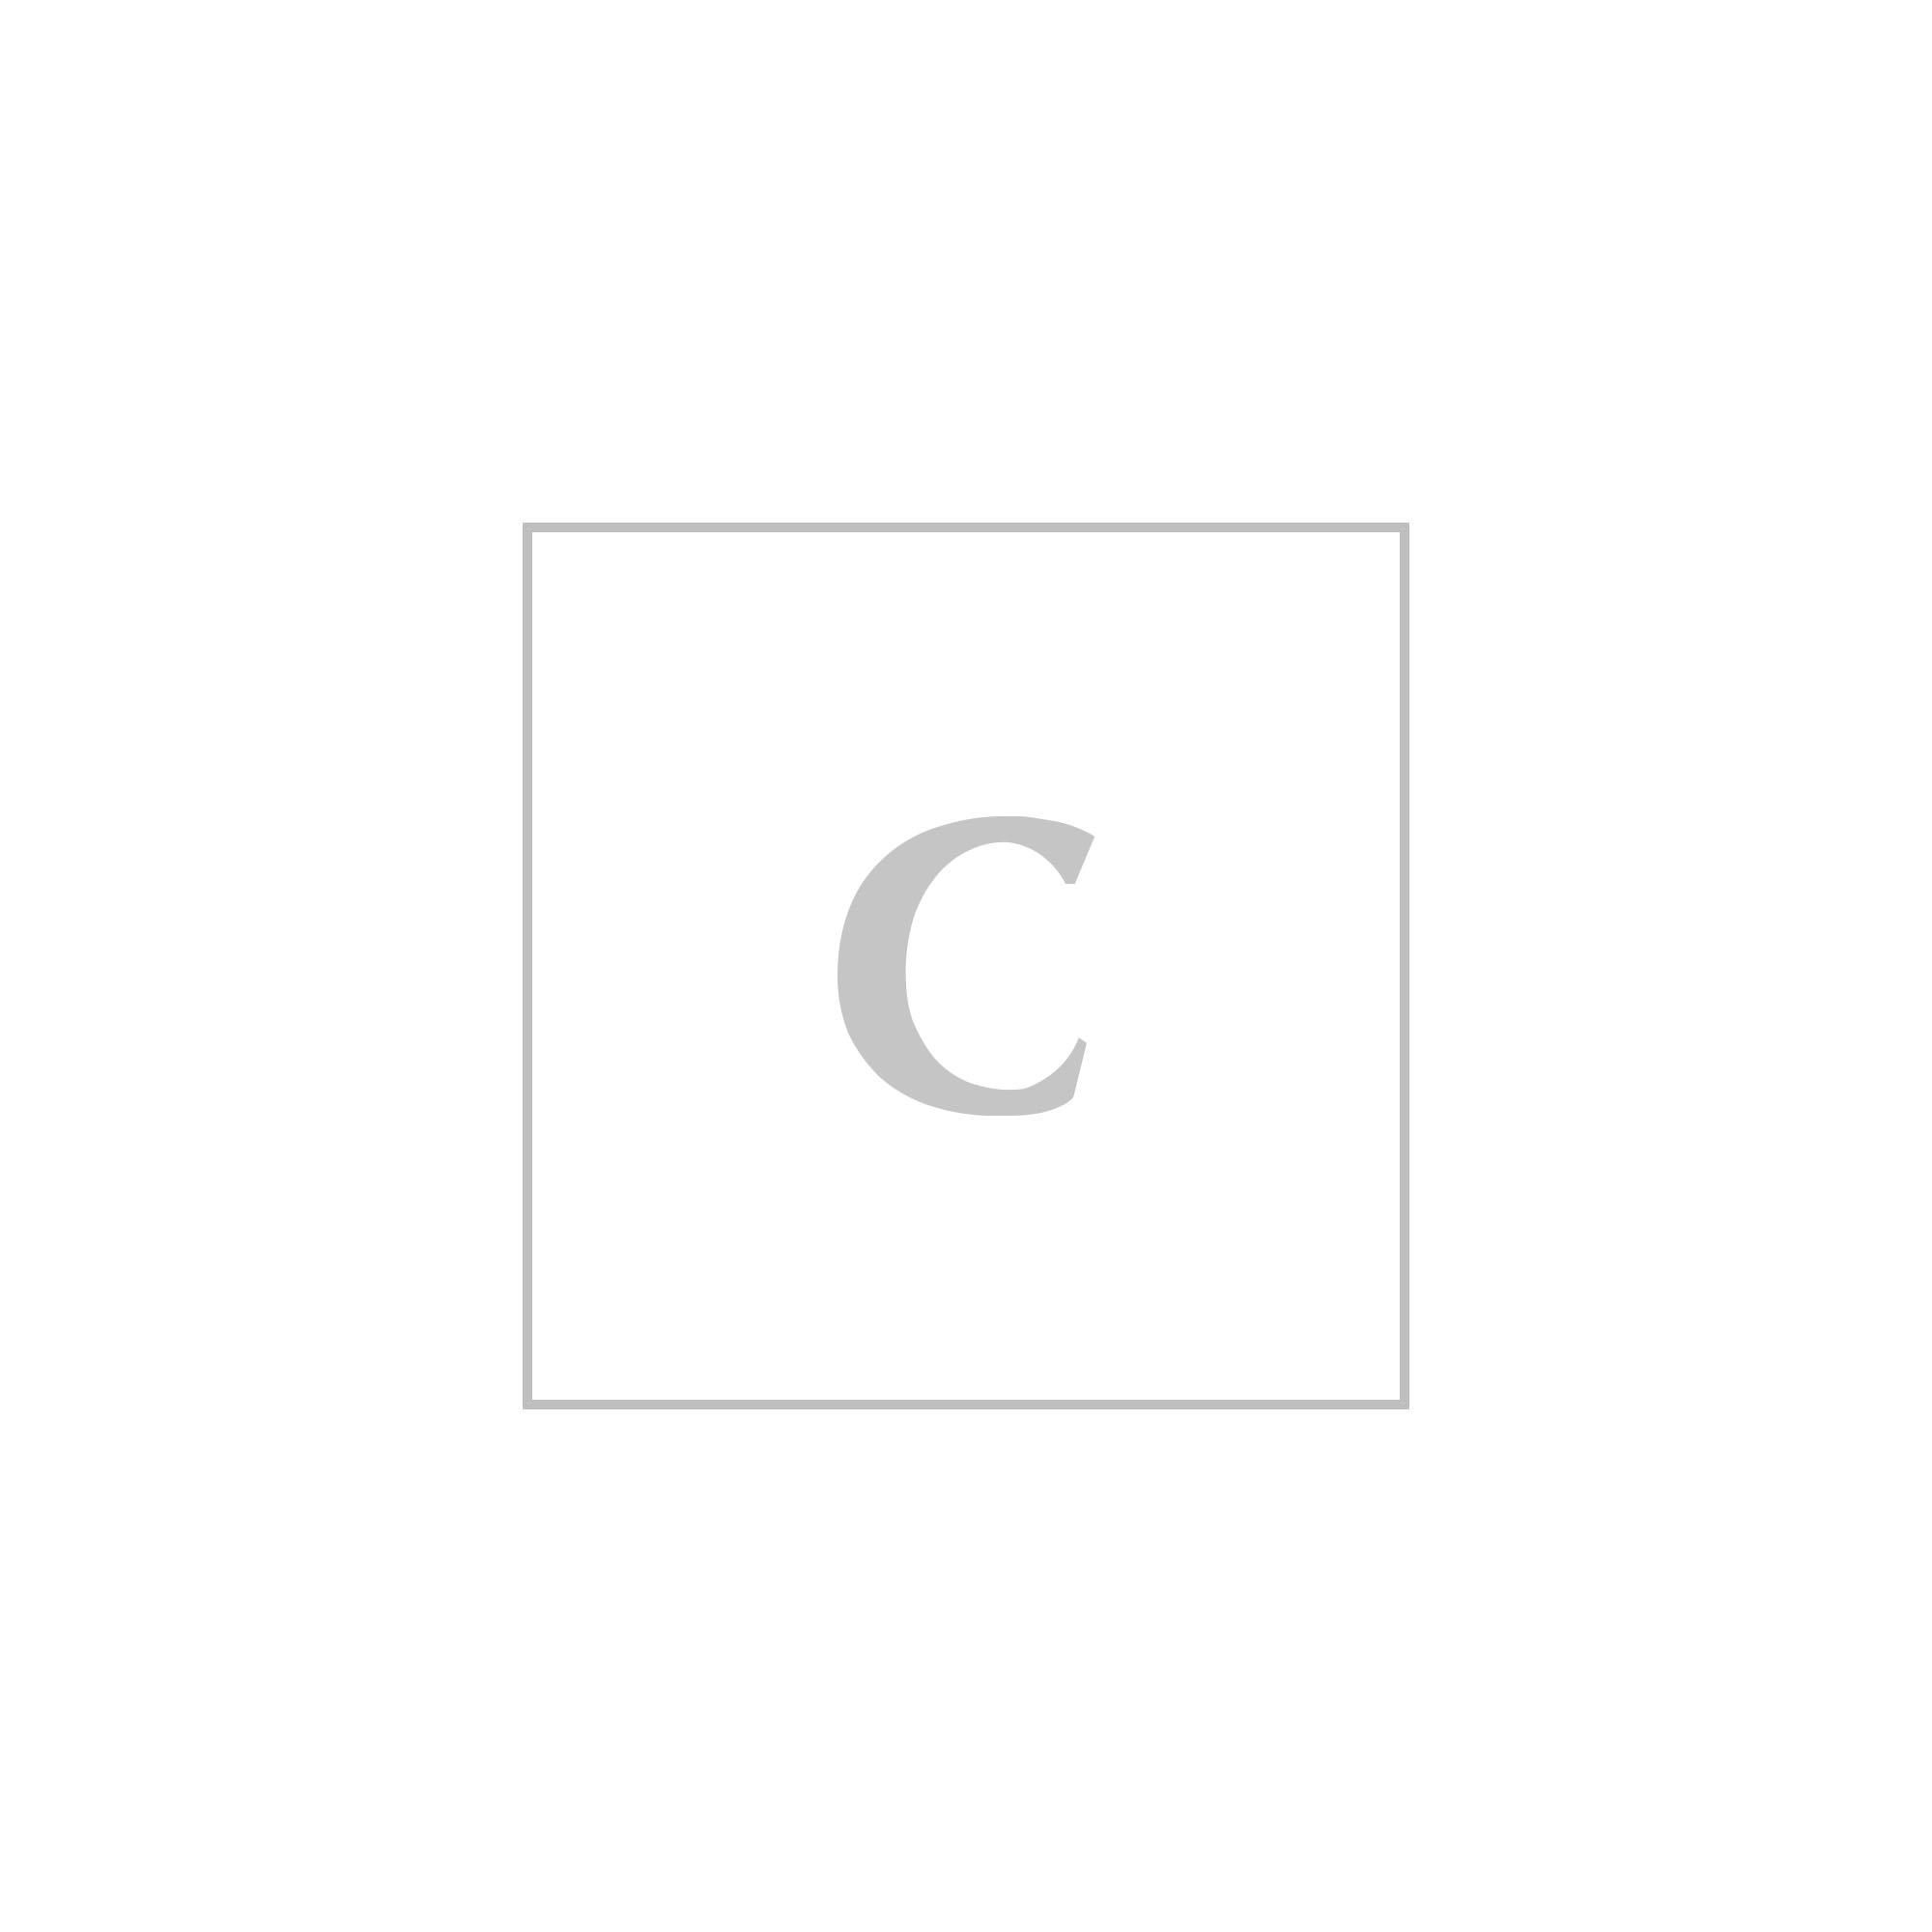 Thomas mason canterbury cotton pocket square